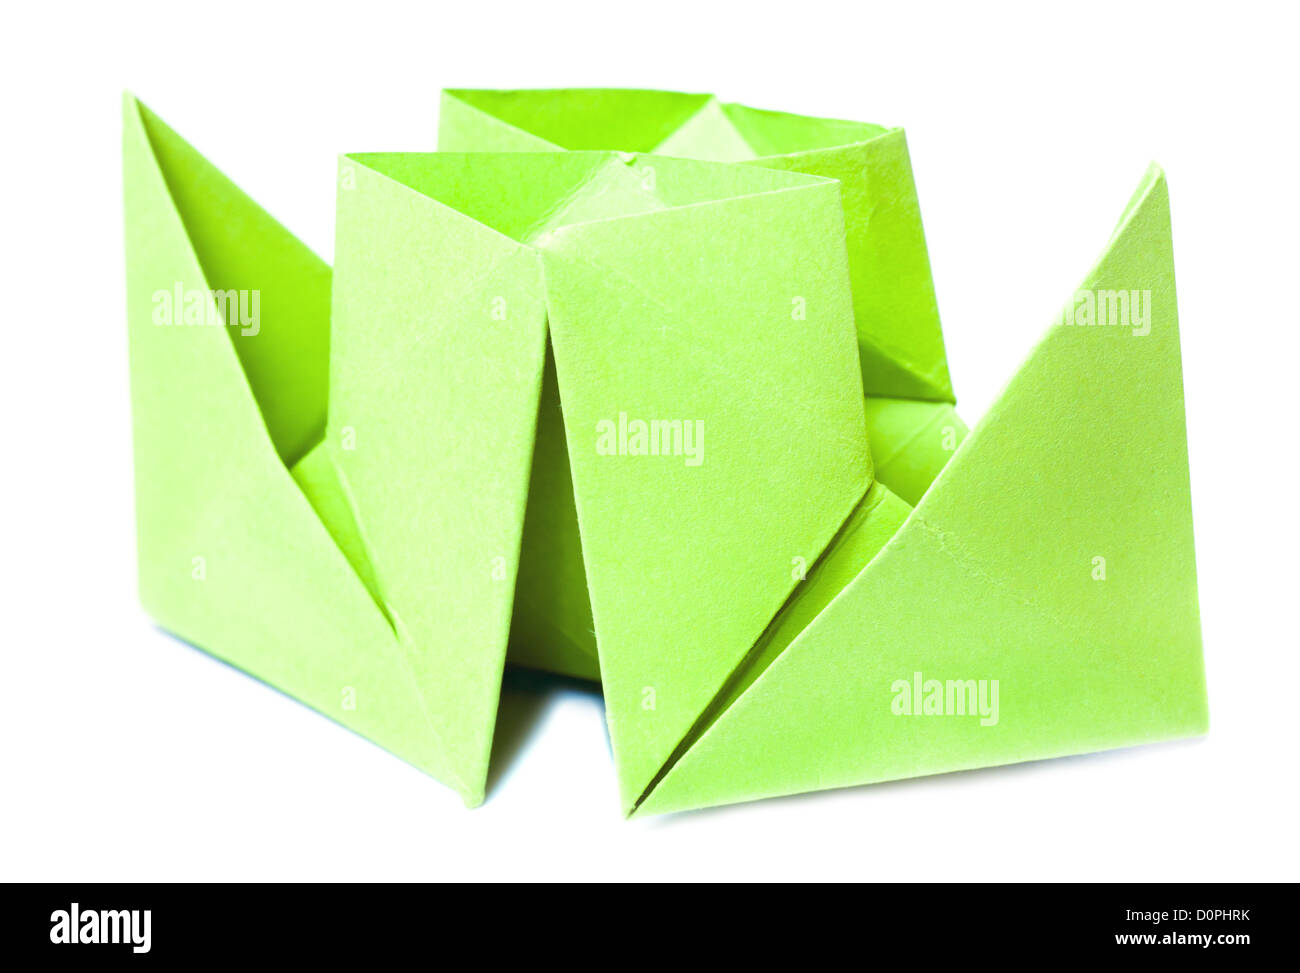 Origami-Figur des Bootes Stockbild